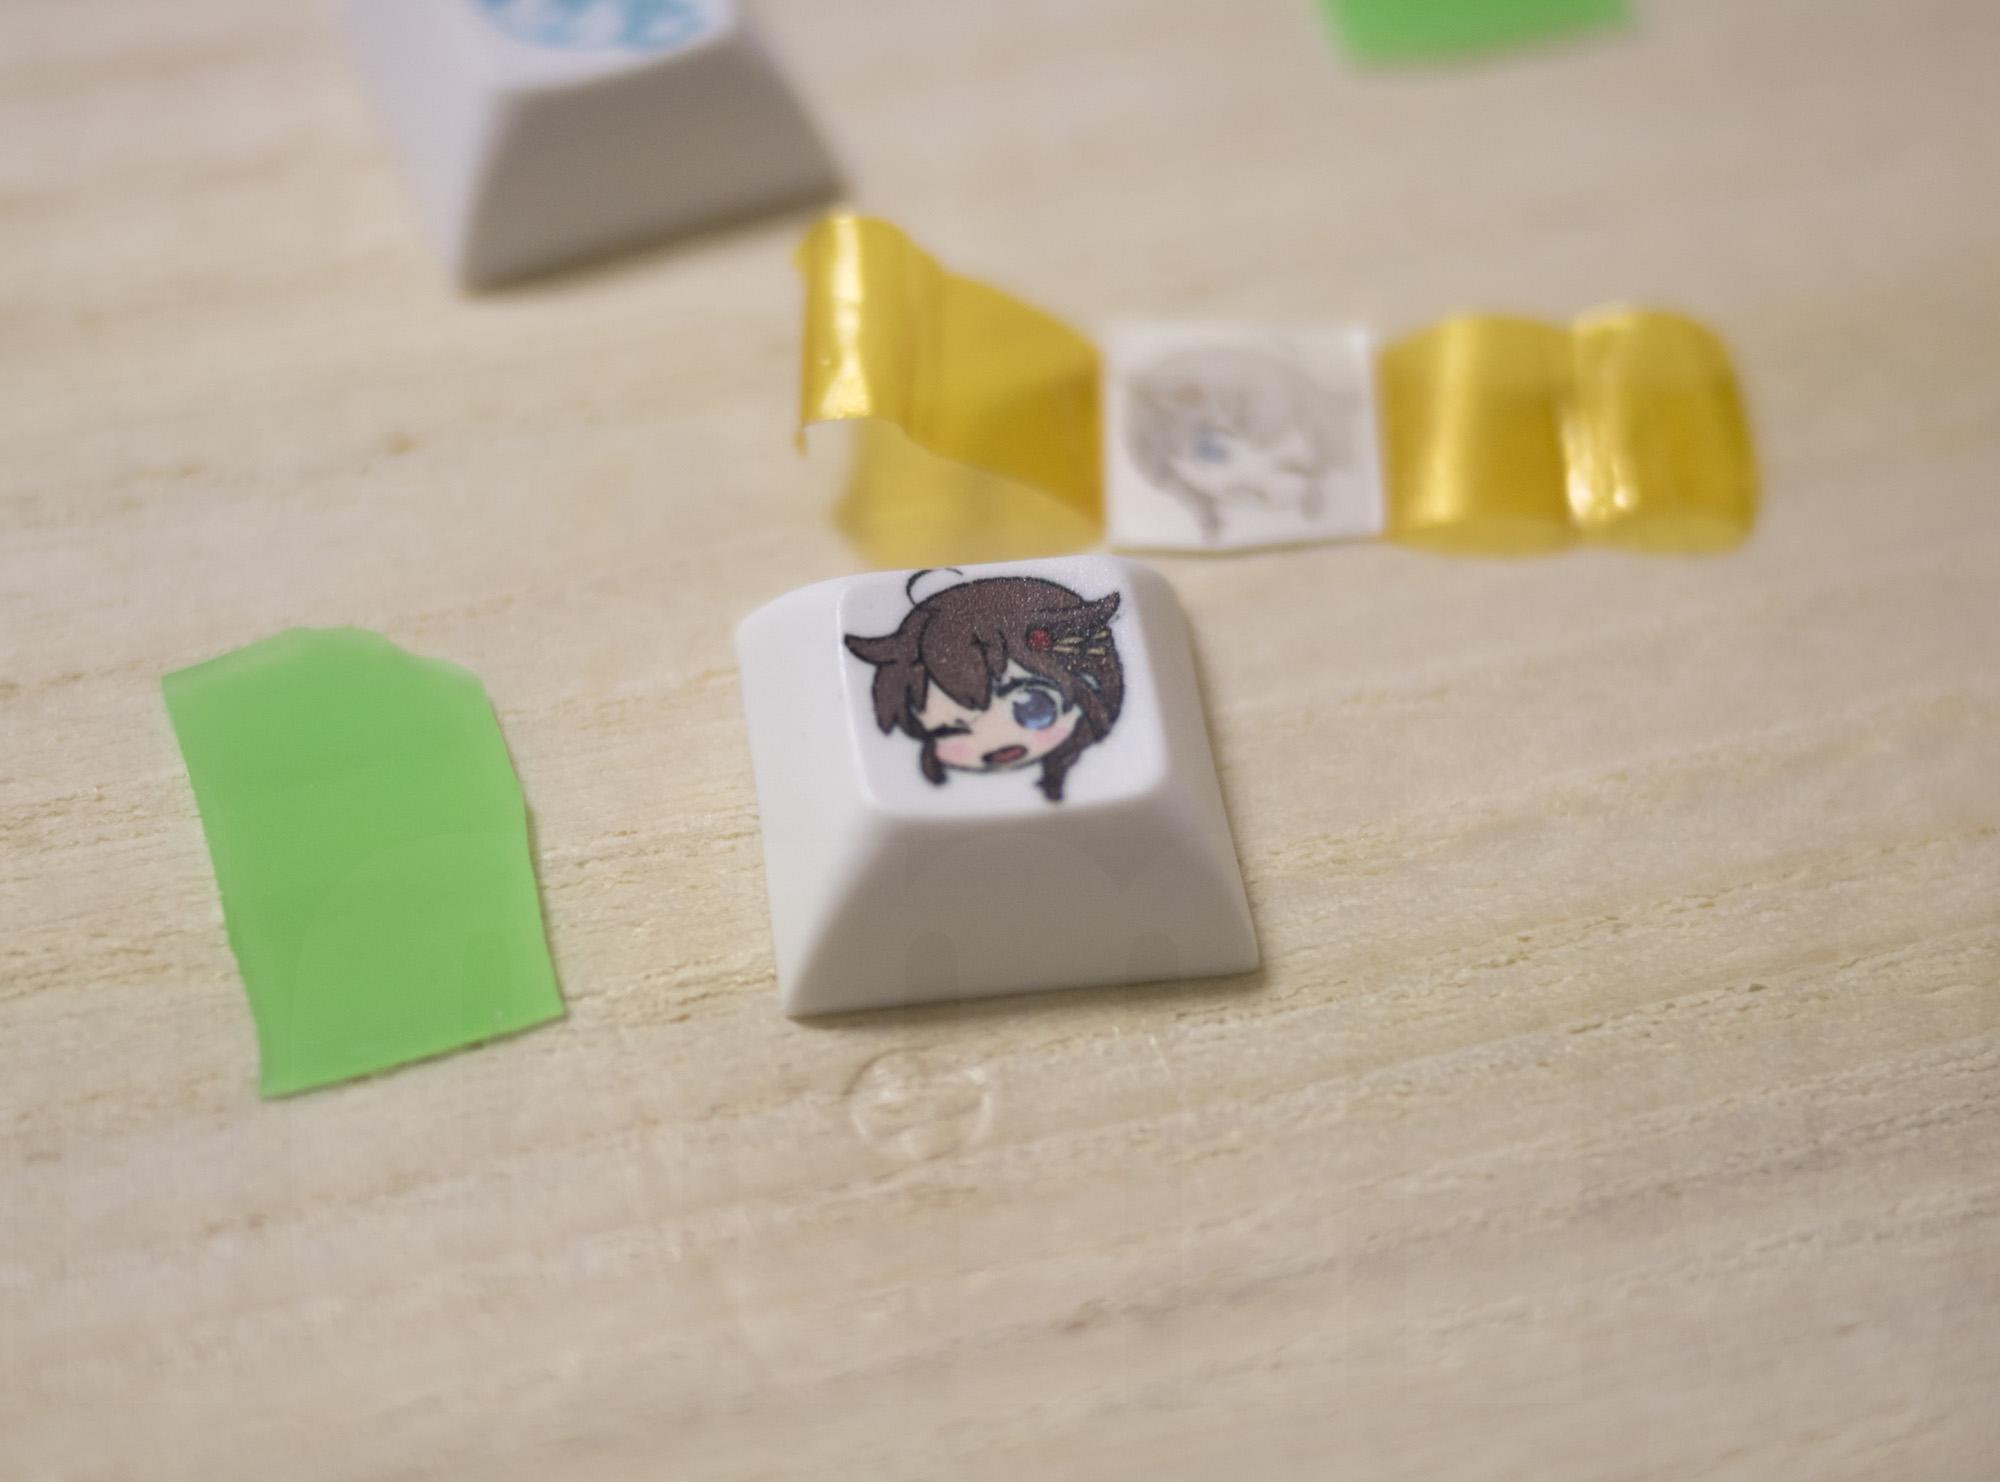 Keycap dye-sub Kan-colle Shigure